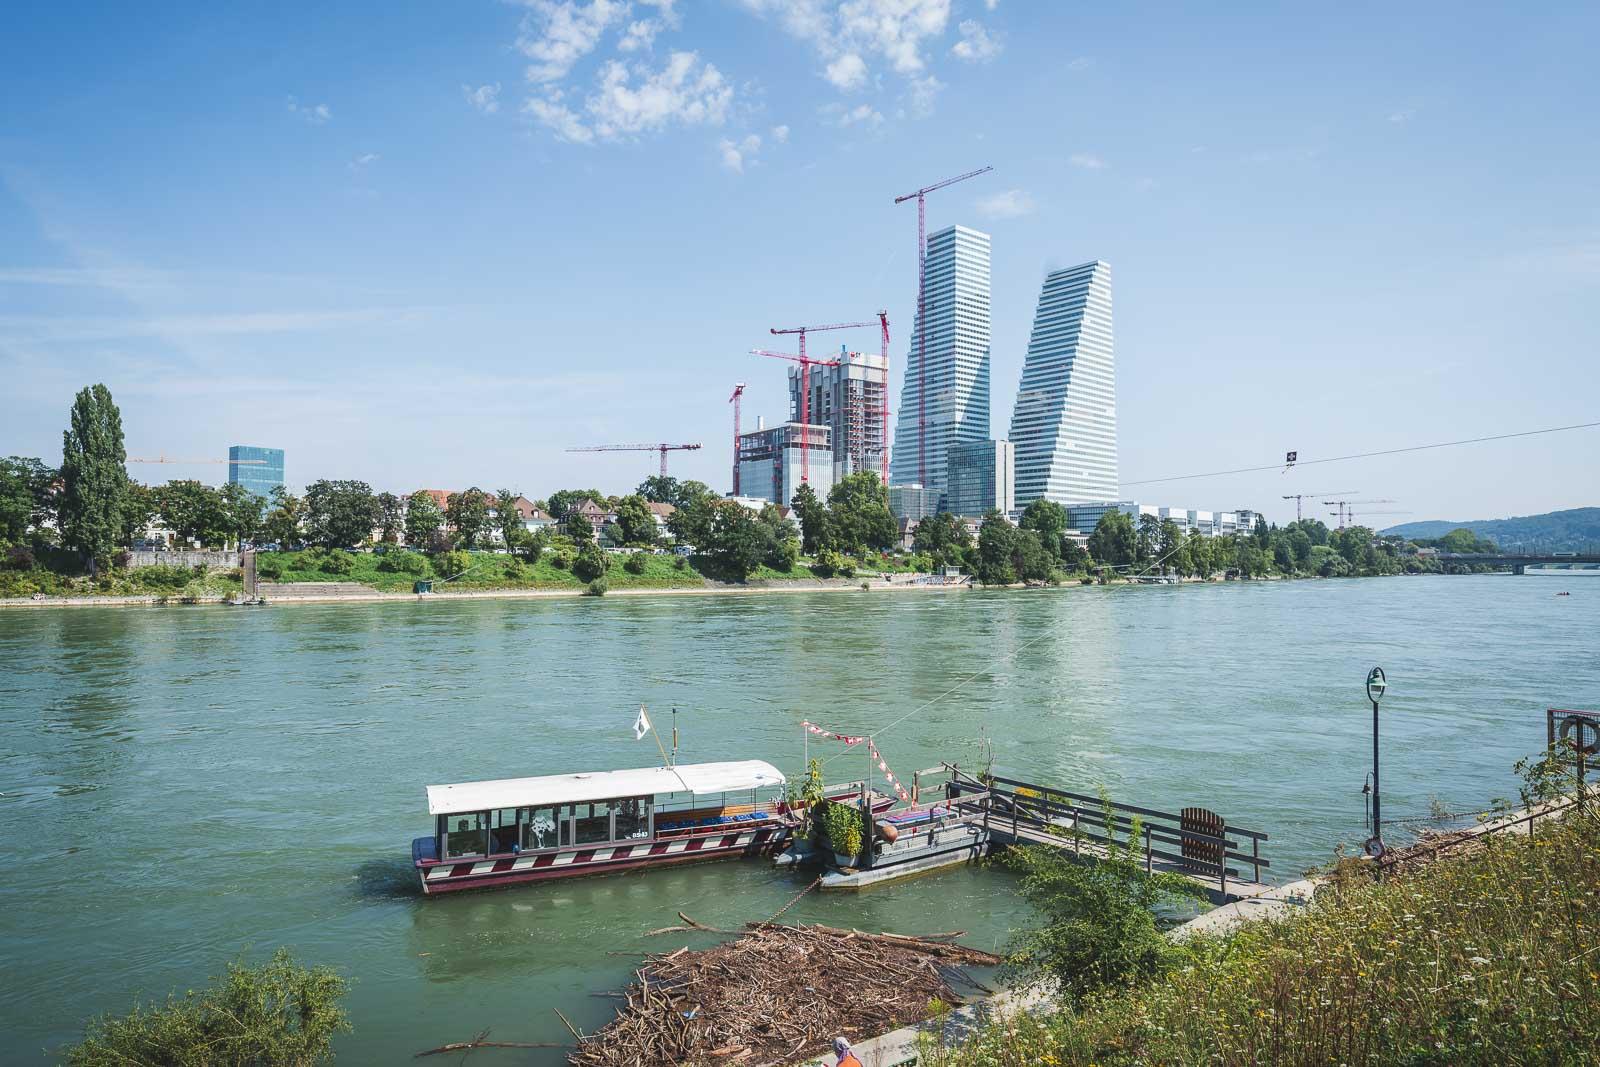 Crossing the Rhine River in Basel